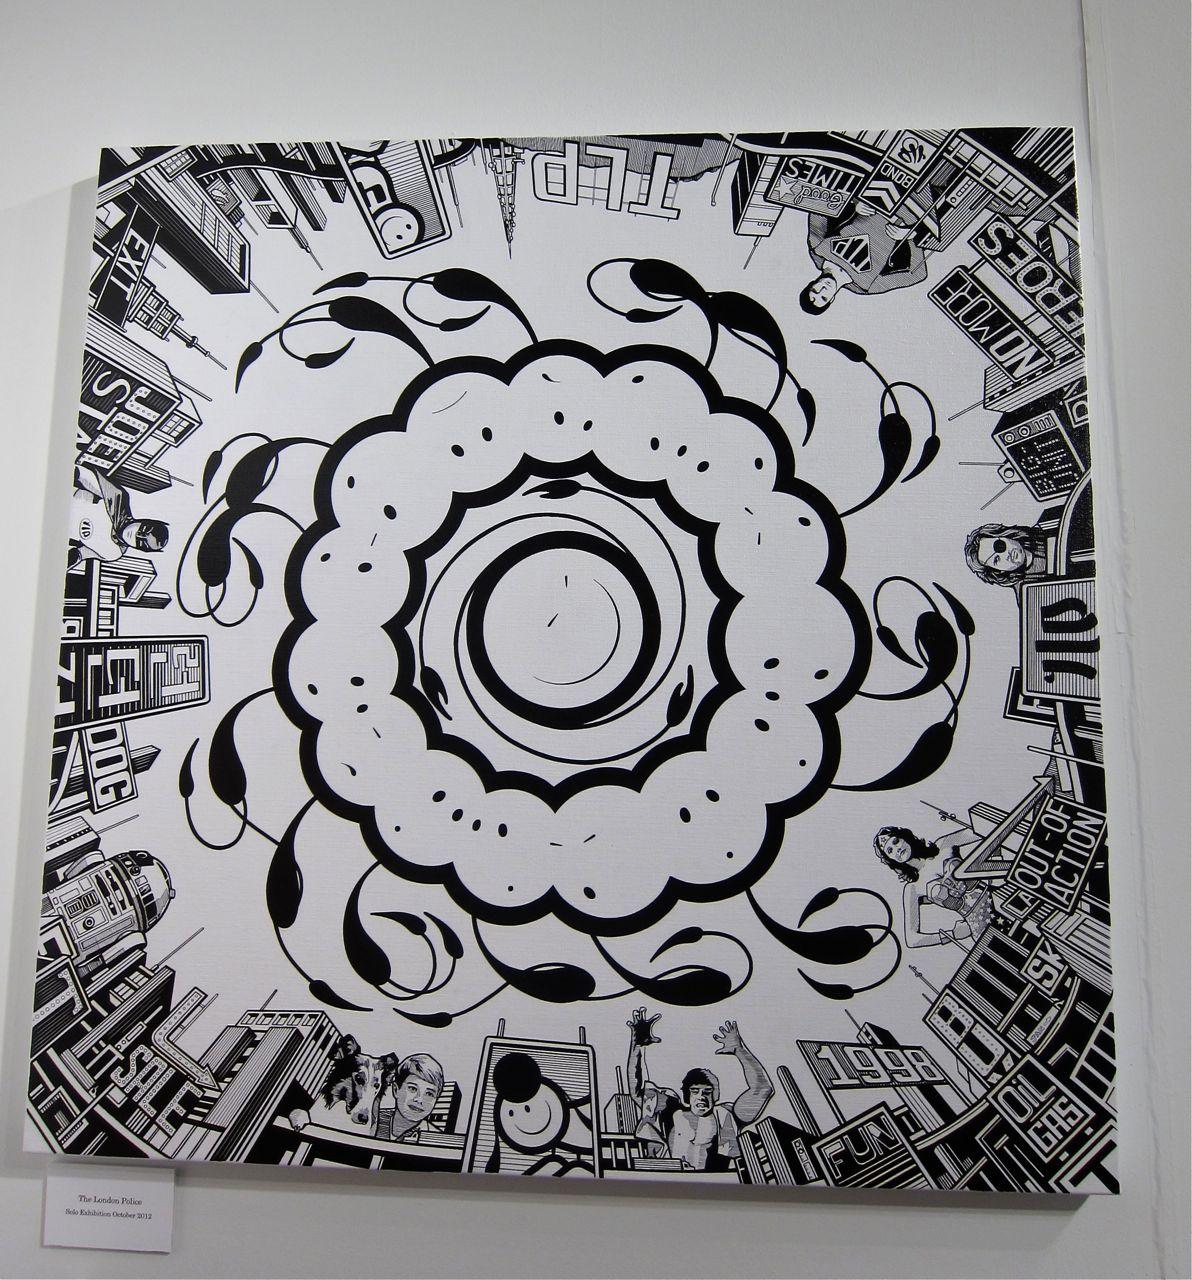 Scope Miami Corey Helford Gallery AM 02